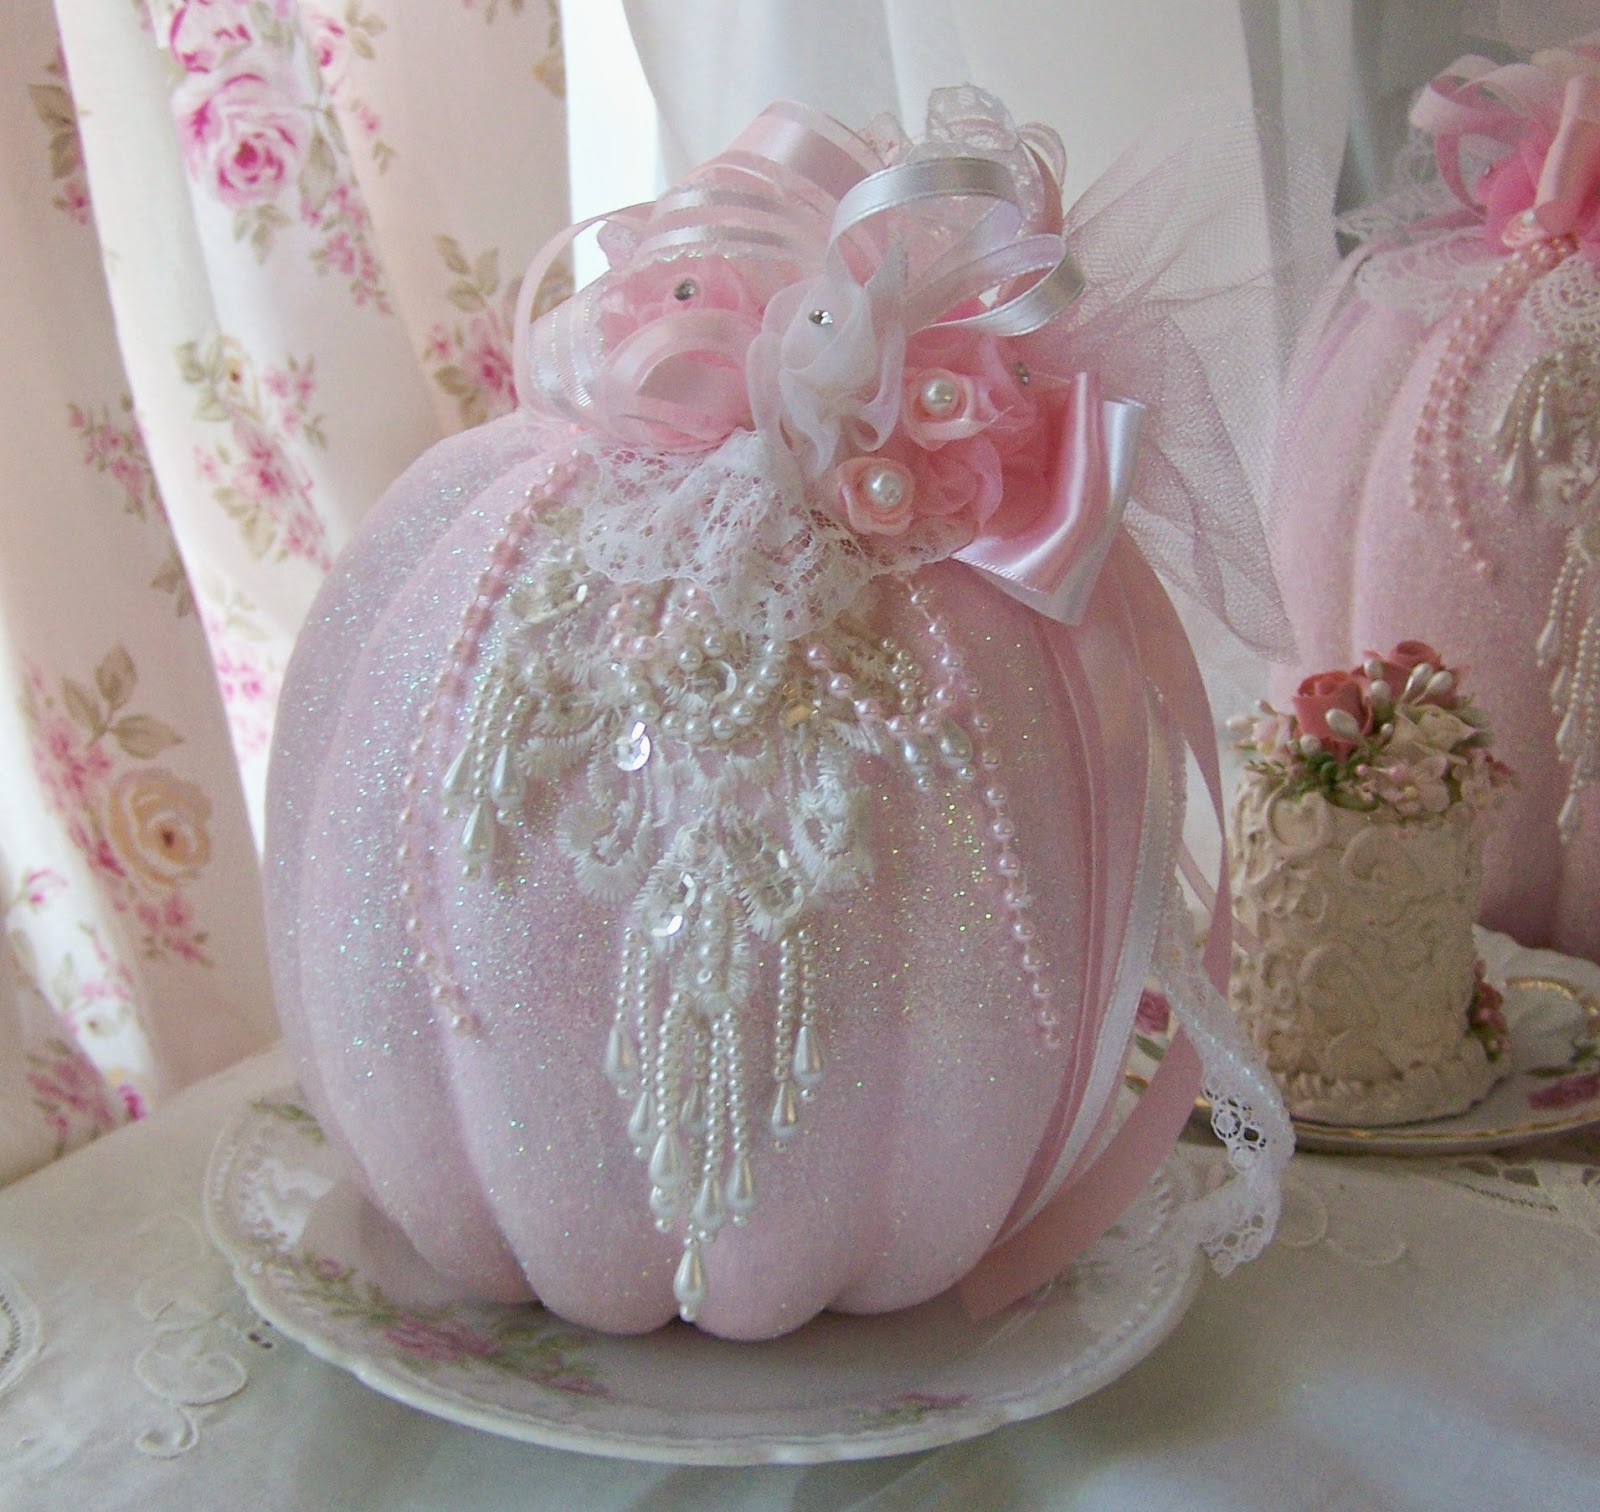 Olivia's Romantic Home: Pink Glam Pumpkins